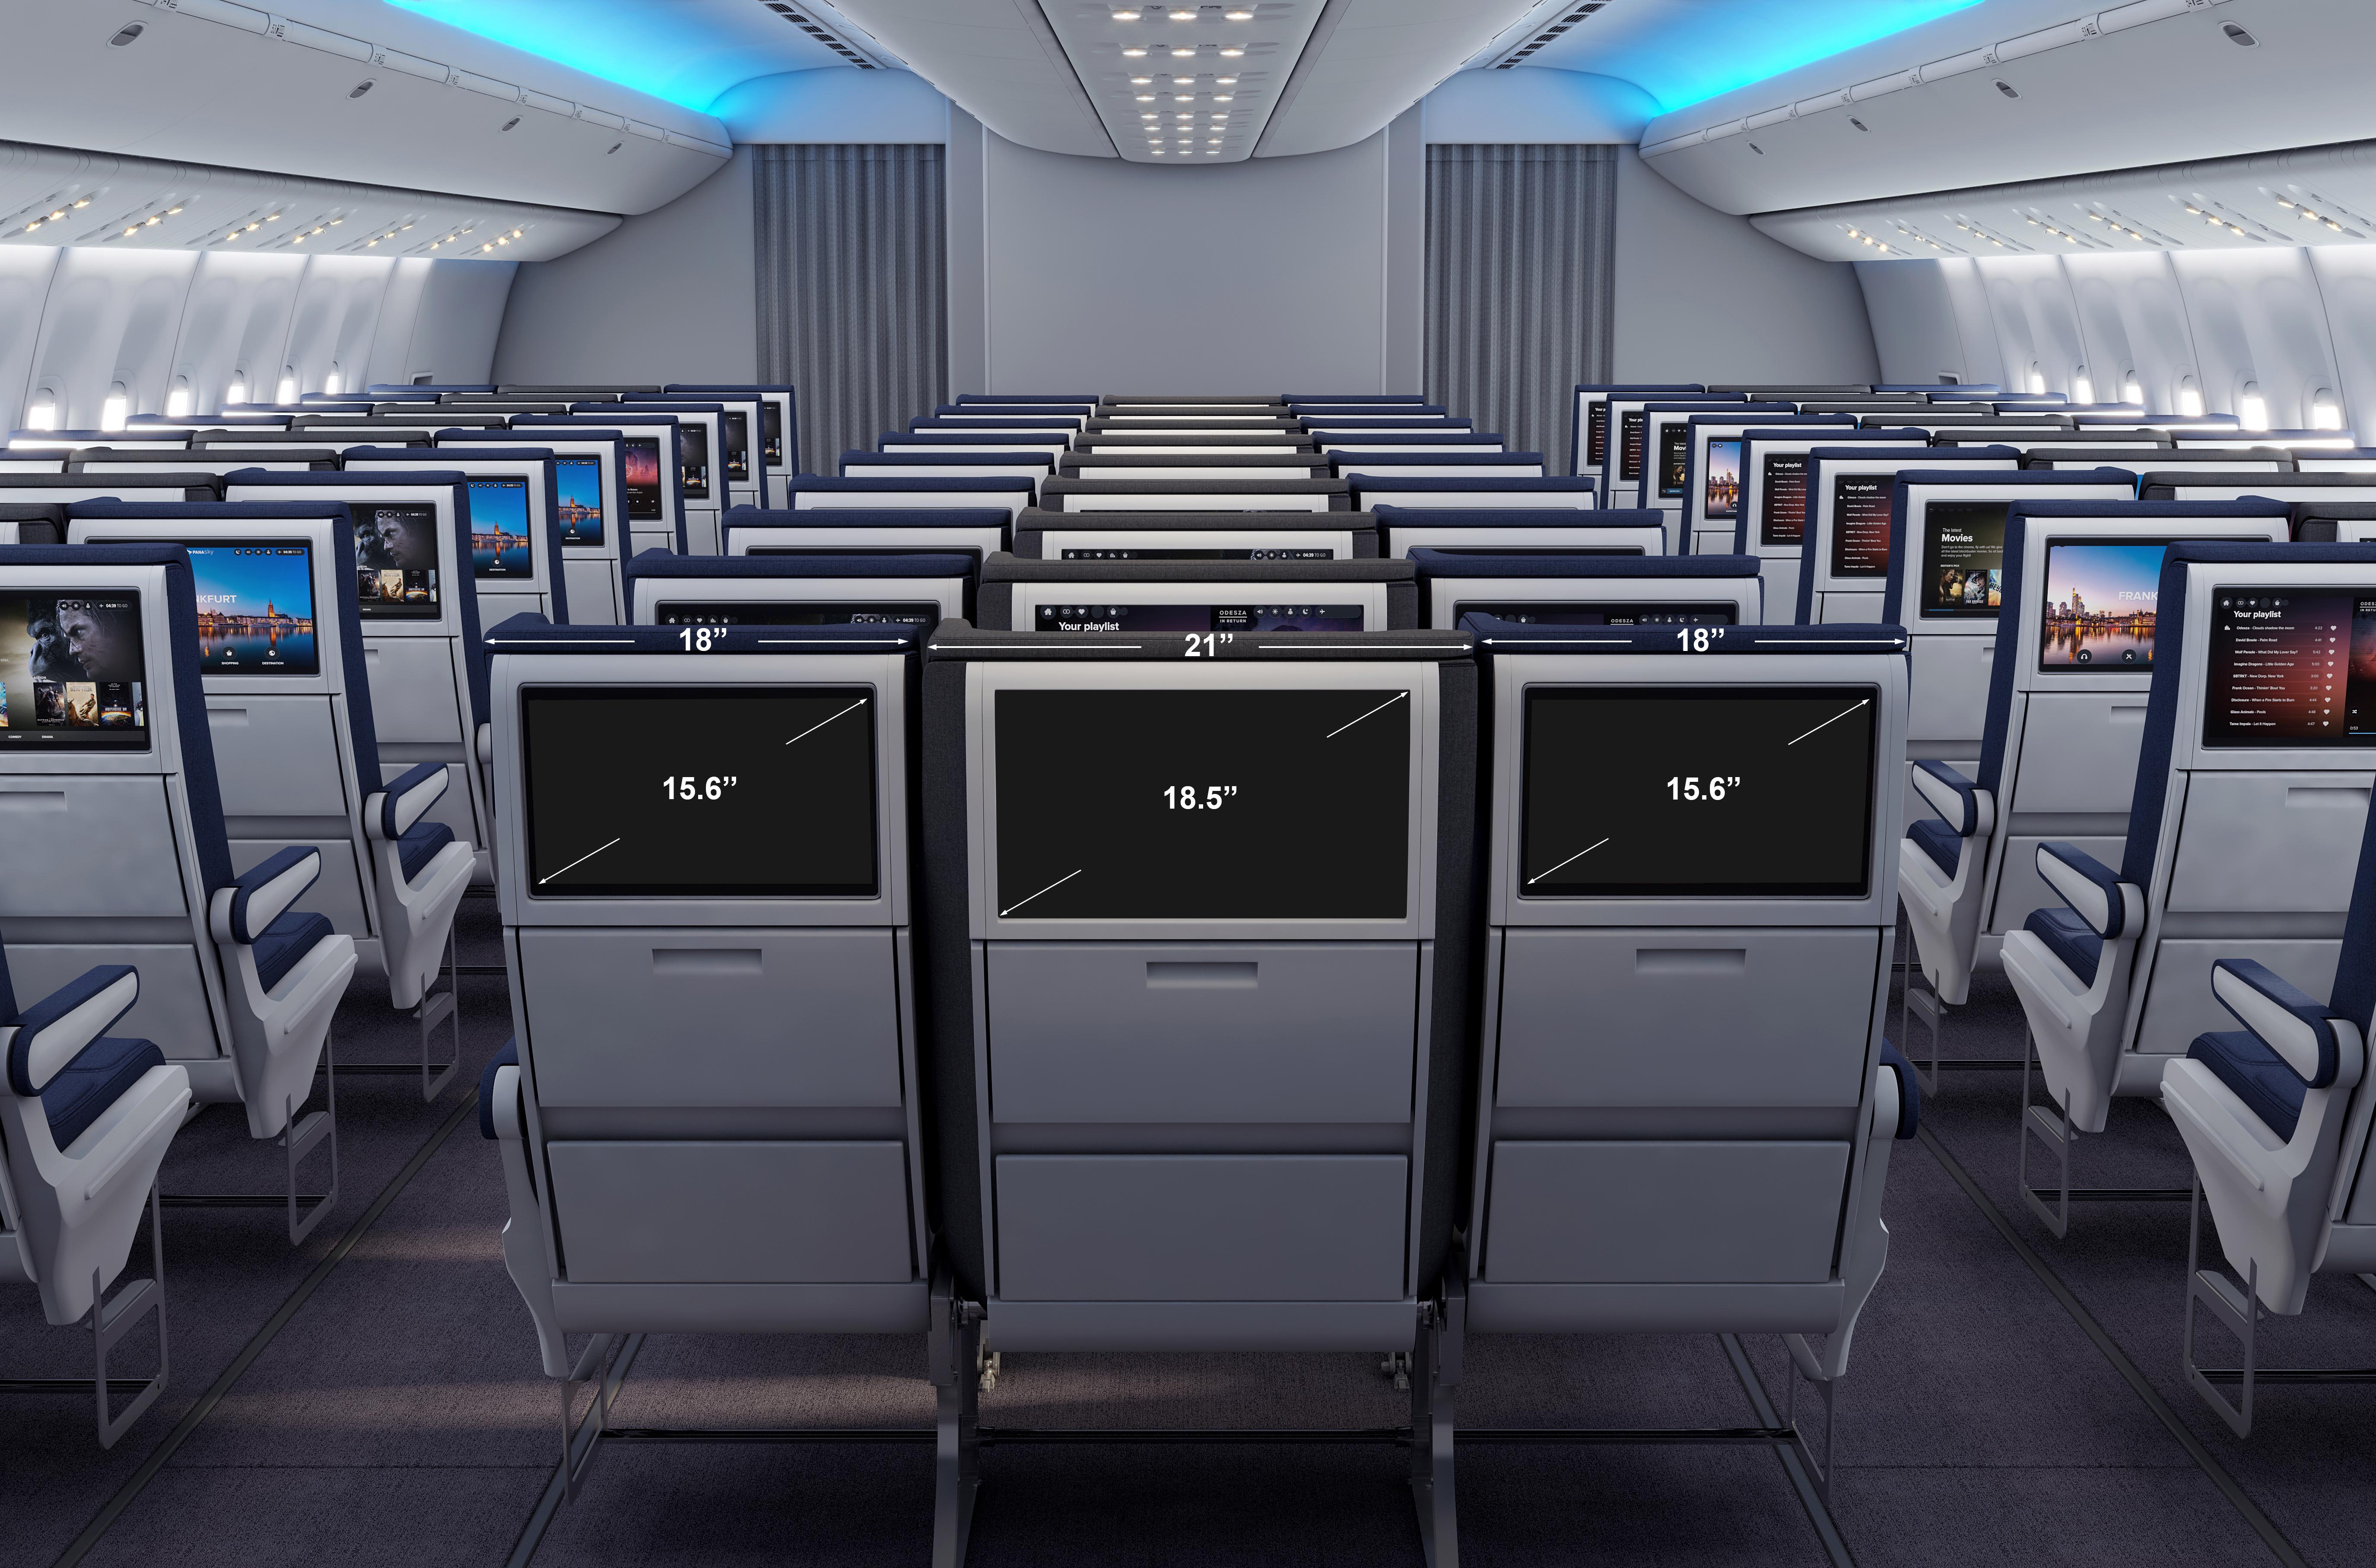 ML Seat-01 Dimensions - C 2